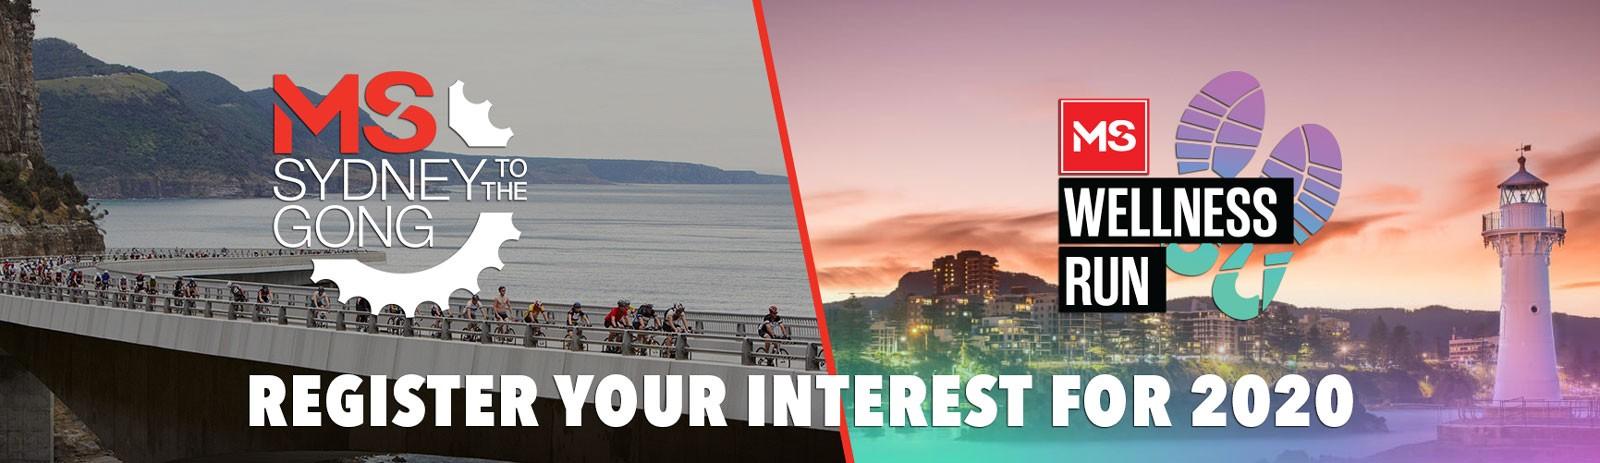 register your interest